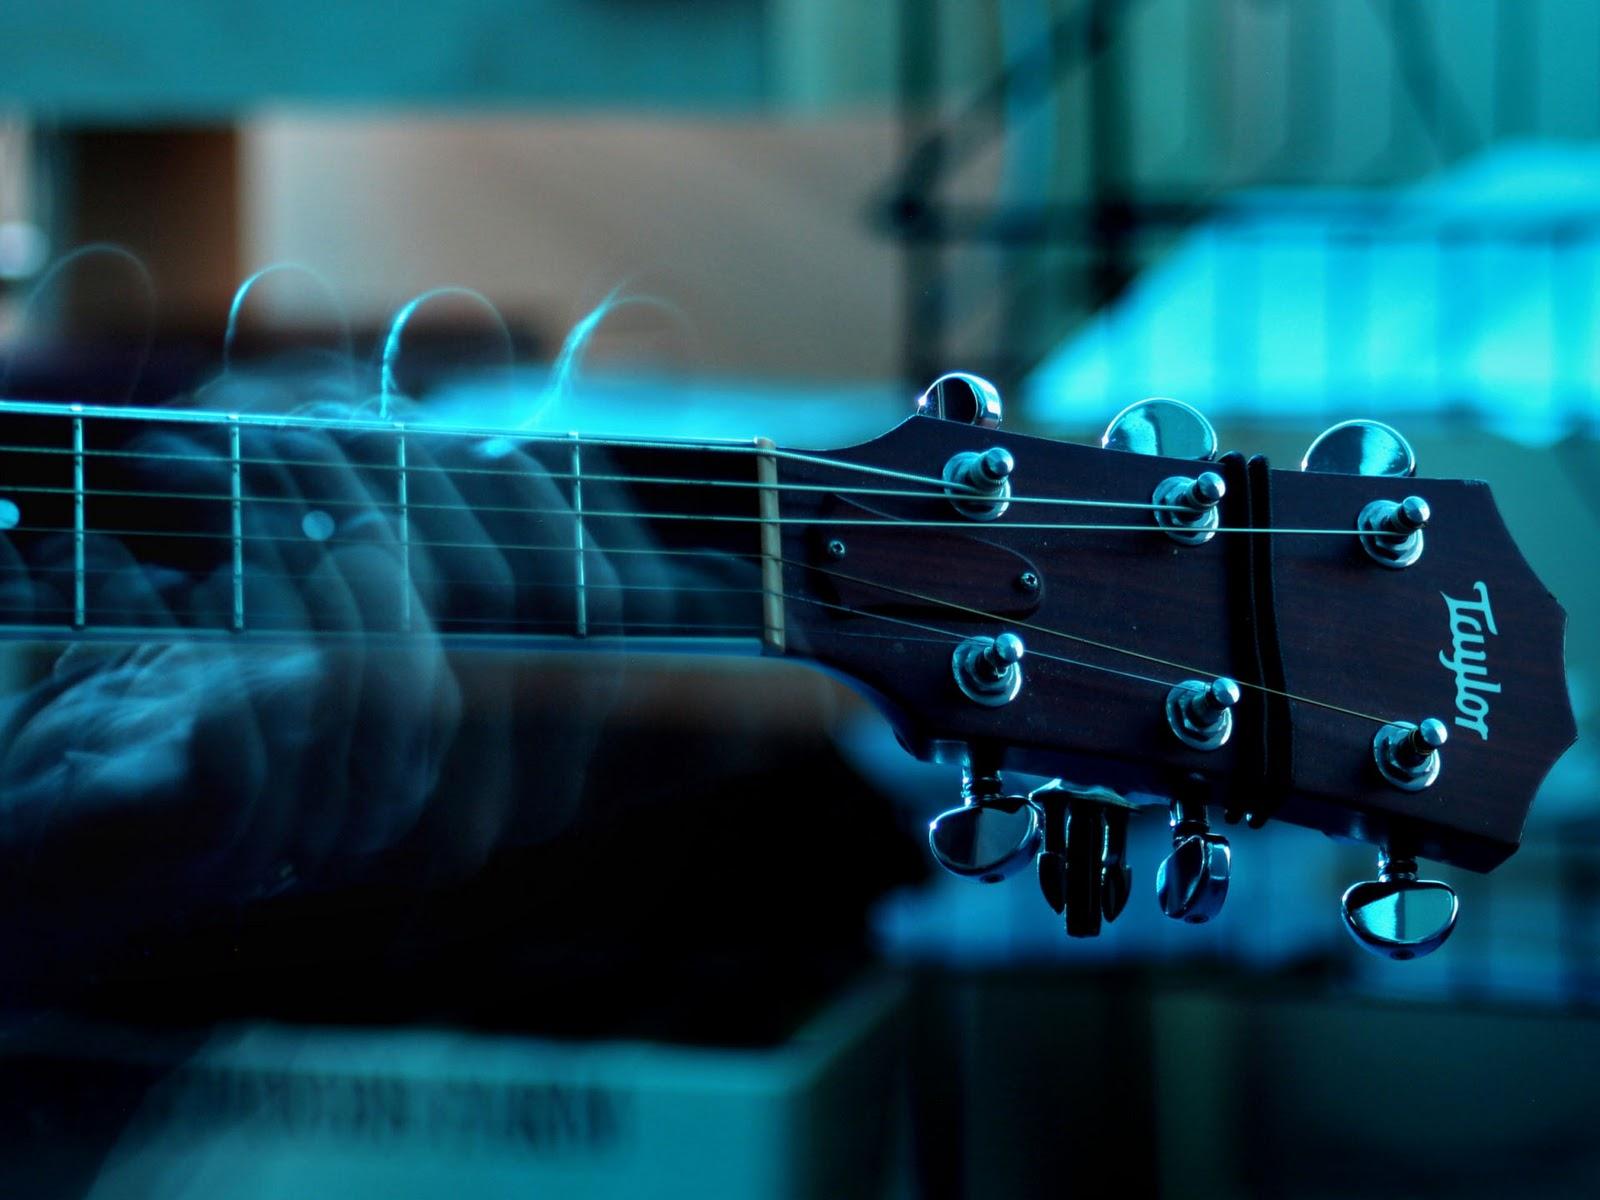 Guitar Wallpaper   Playing Taylor Guitar   1920x1440 Great Guitar 1600x1200